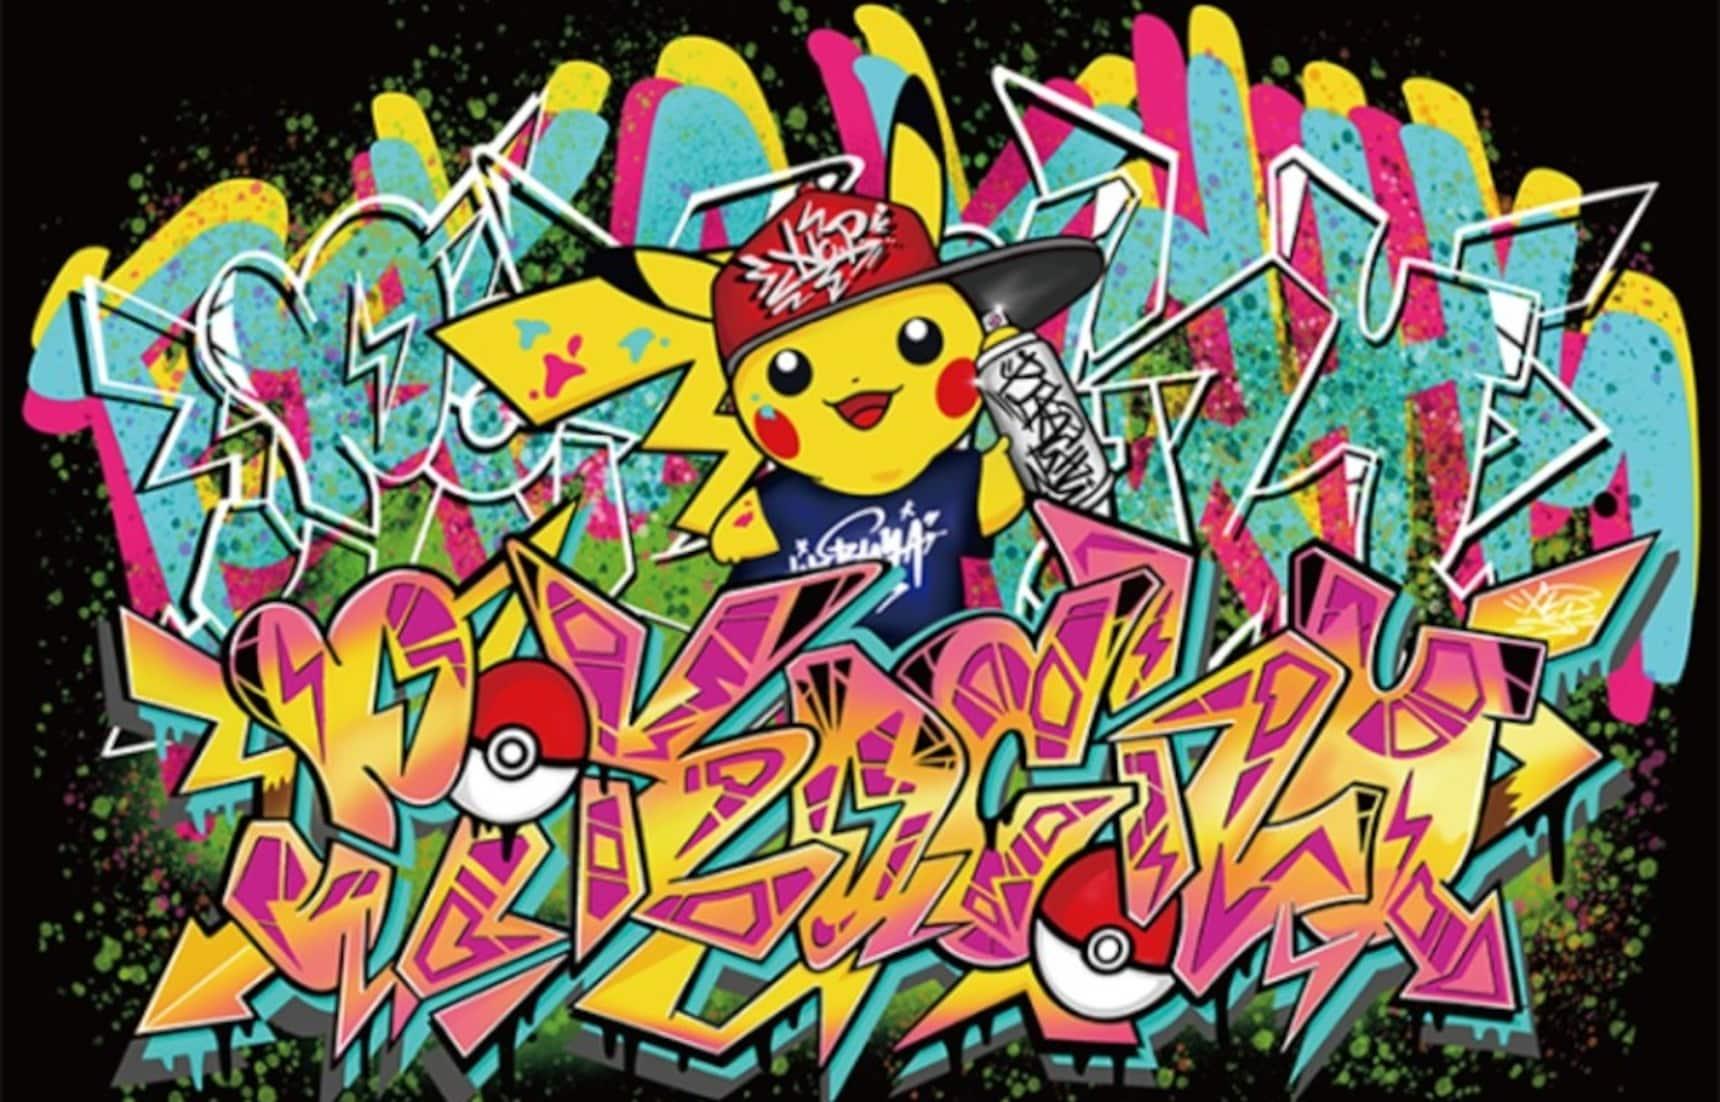 Graffiti Pikachu at Shibuya's Pokémon Center